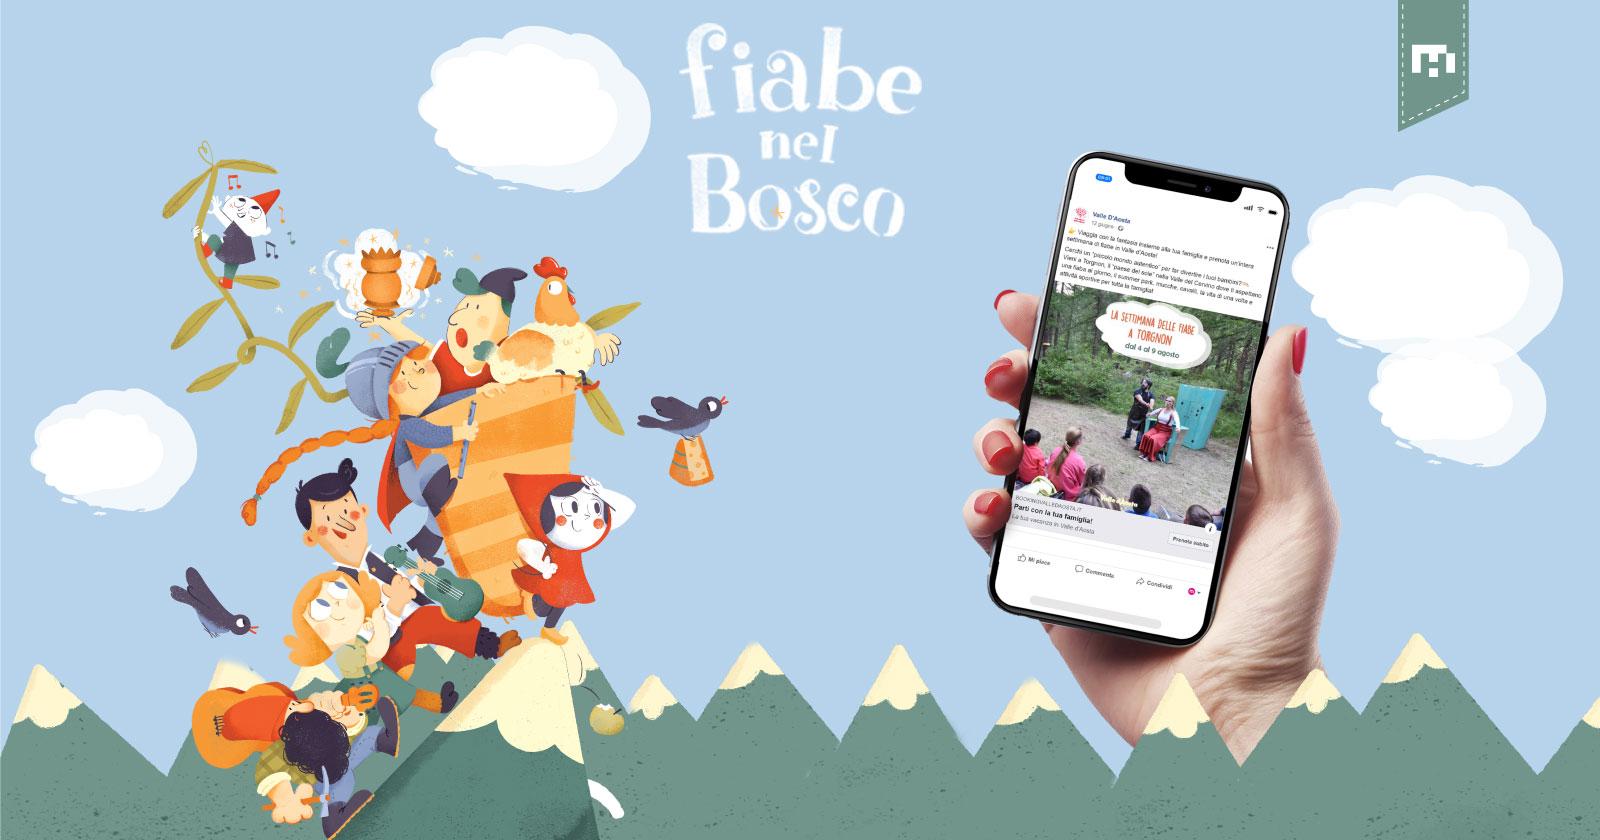 fiabe_nel_bosco_valledaosta_digitaladvertising_turismo-condivisione